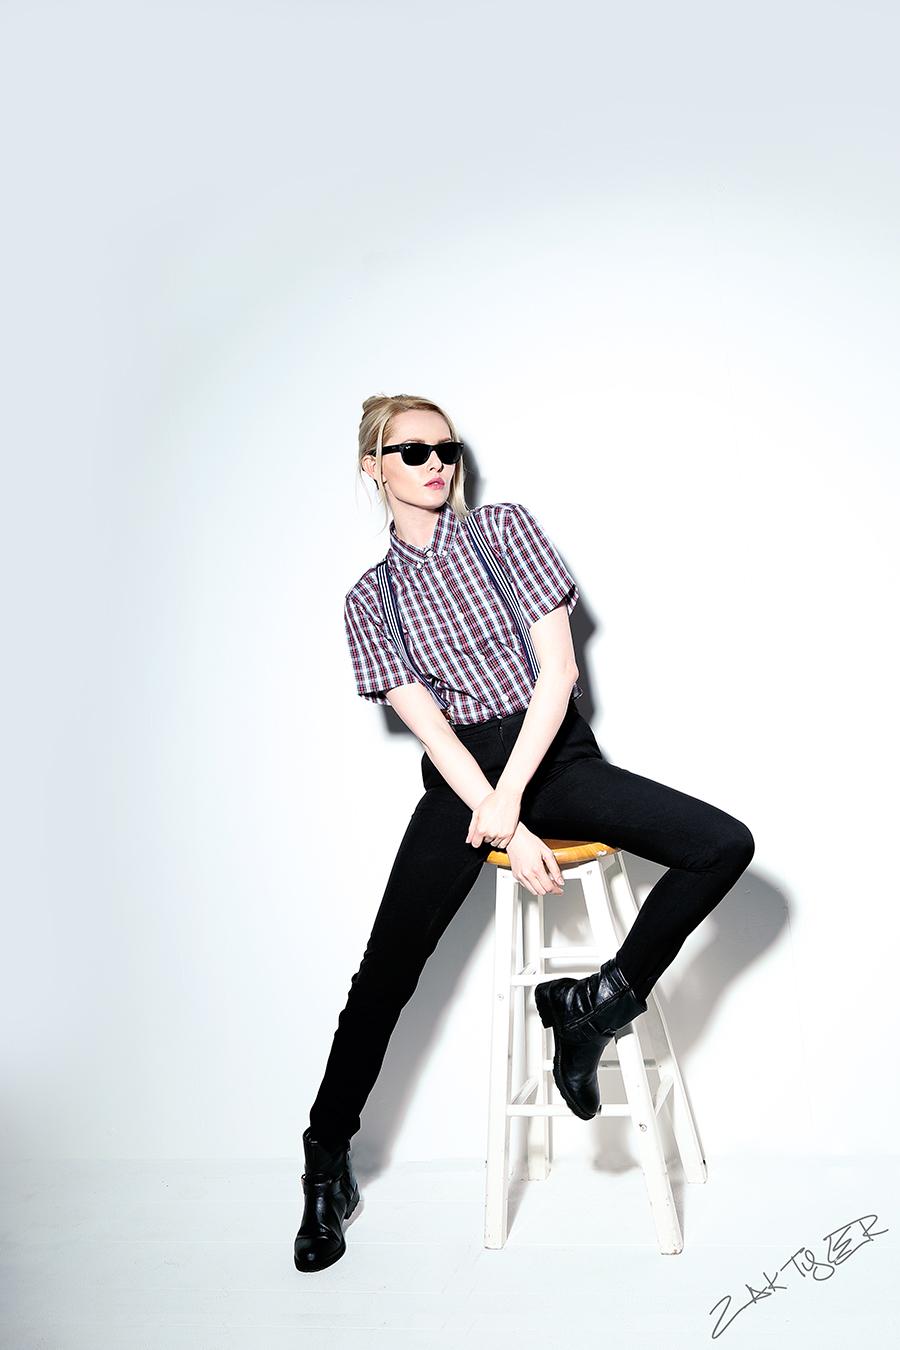 About a boy / Model Carla Monaco, Makeup by Mirka make up artist / Uploaded 5th July 2016 @ 02:54 PM